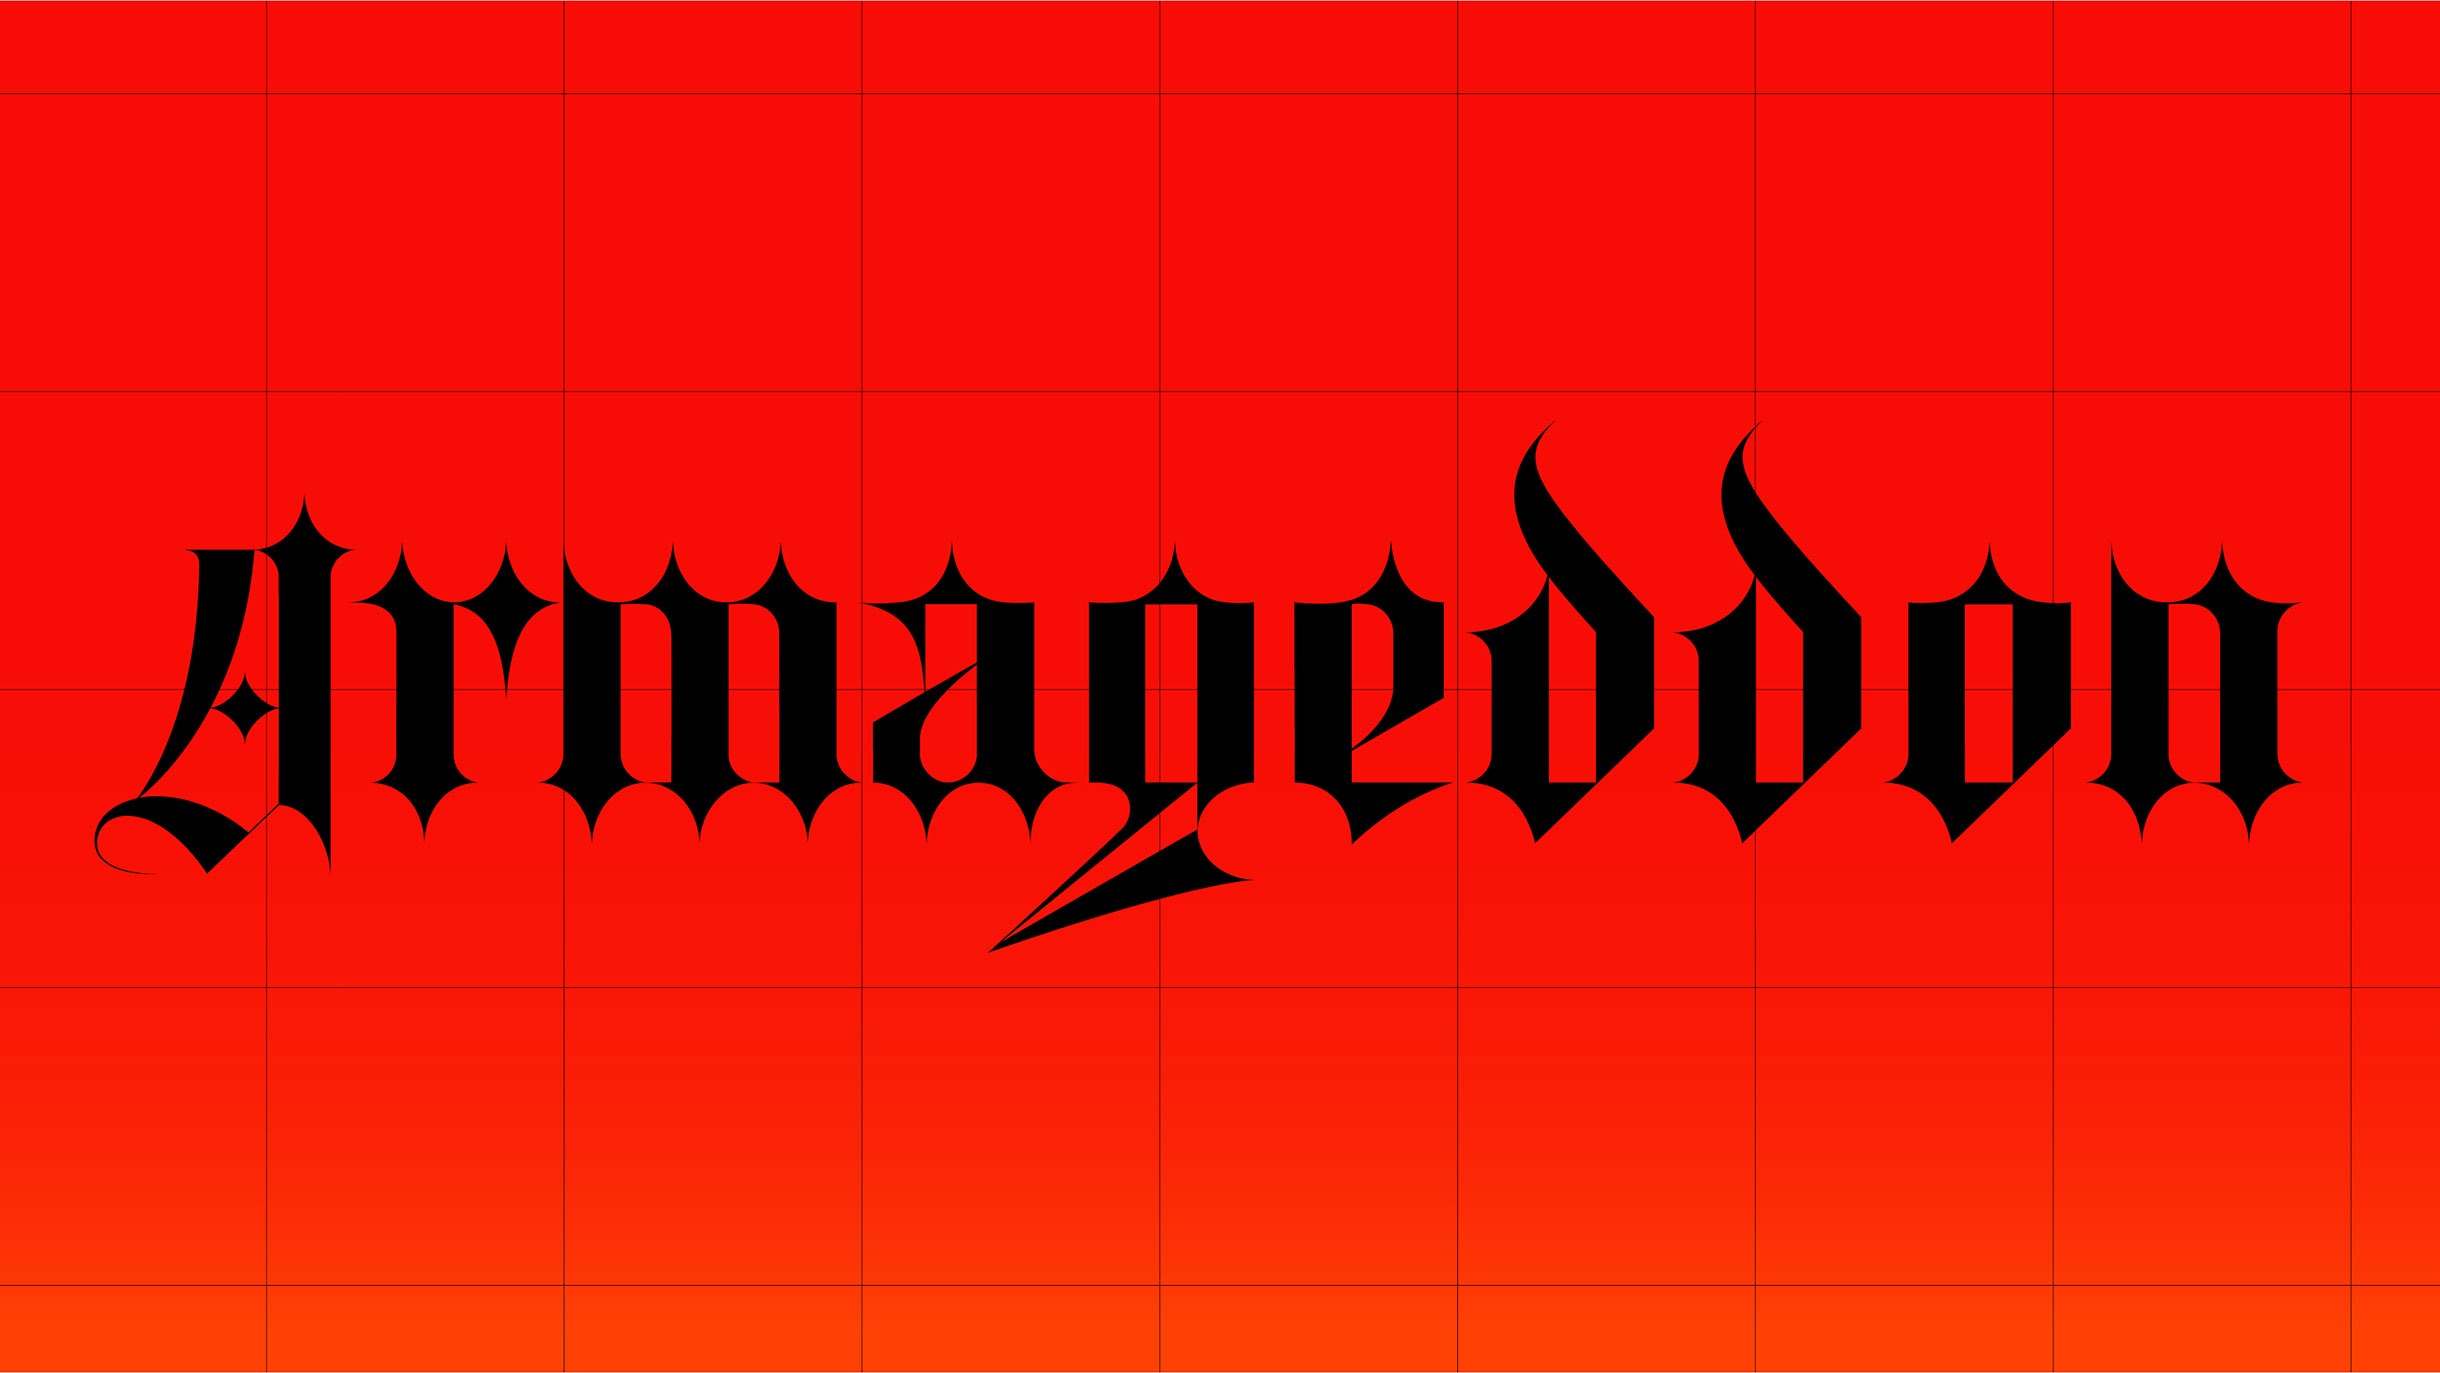 armageddon-adcr_01_15907439975ed0d3bd33235